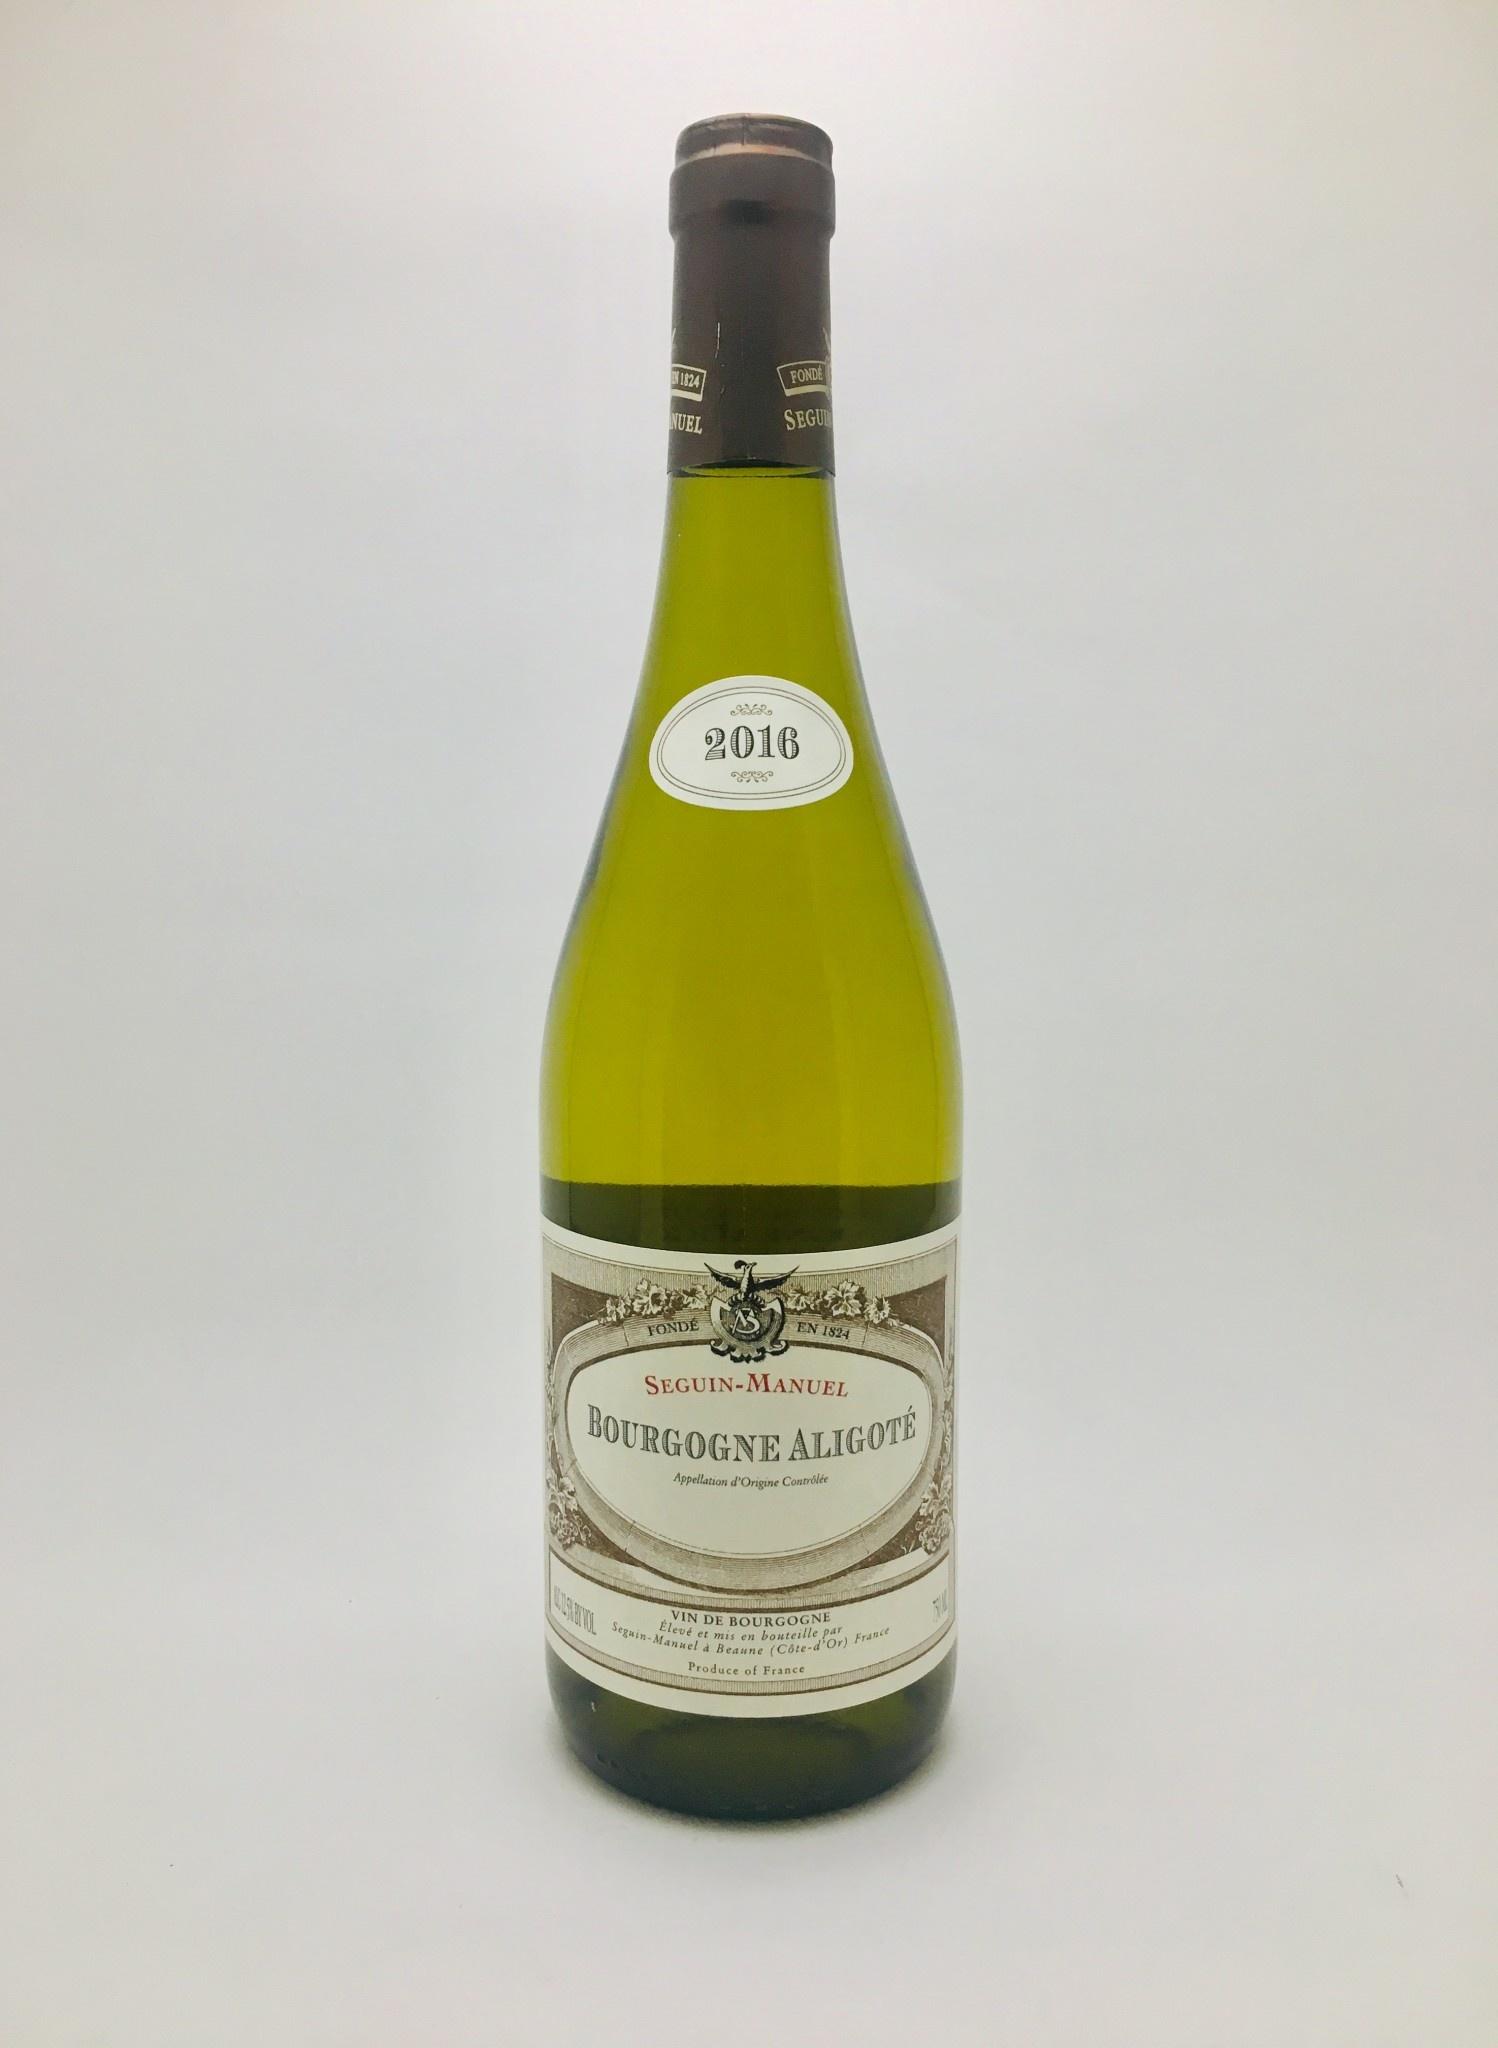 Domaine Seguin-Manuel Bourgogne Aligoté 2018